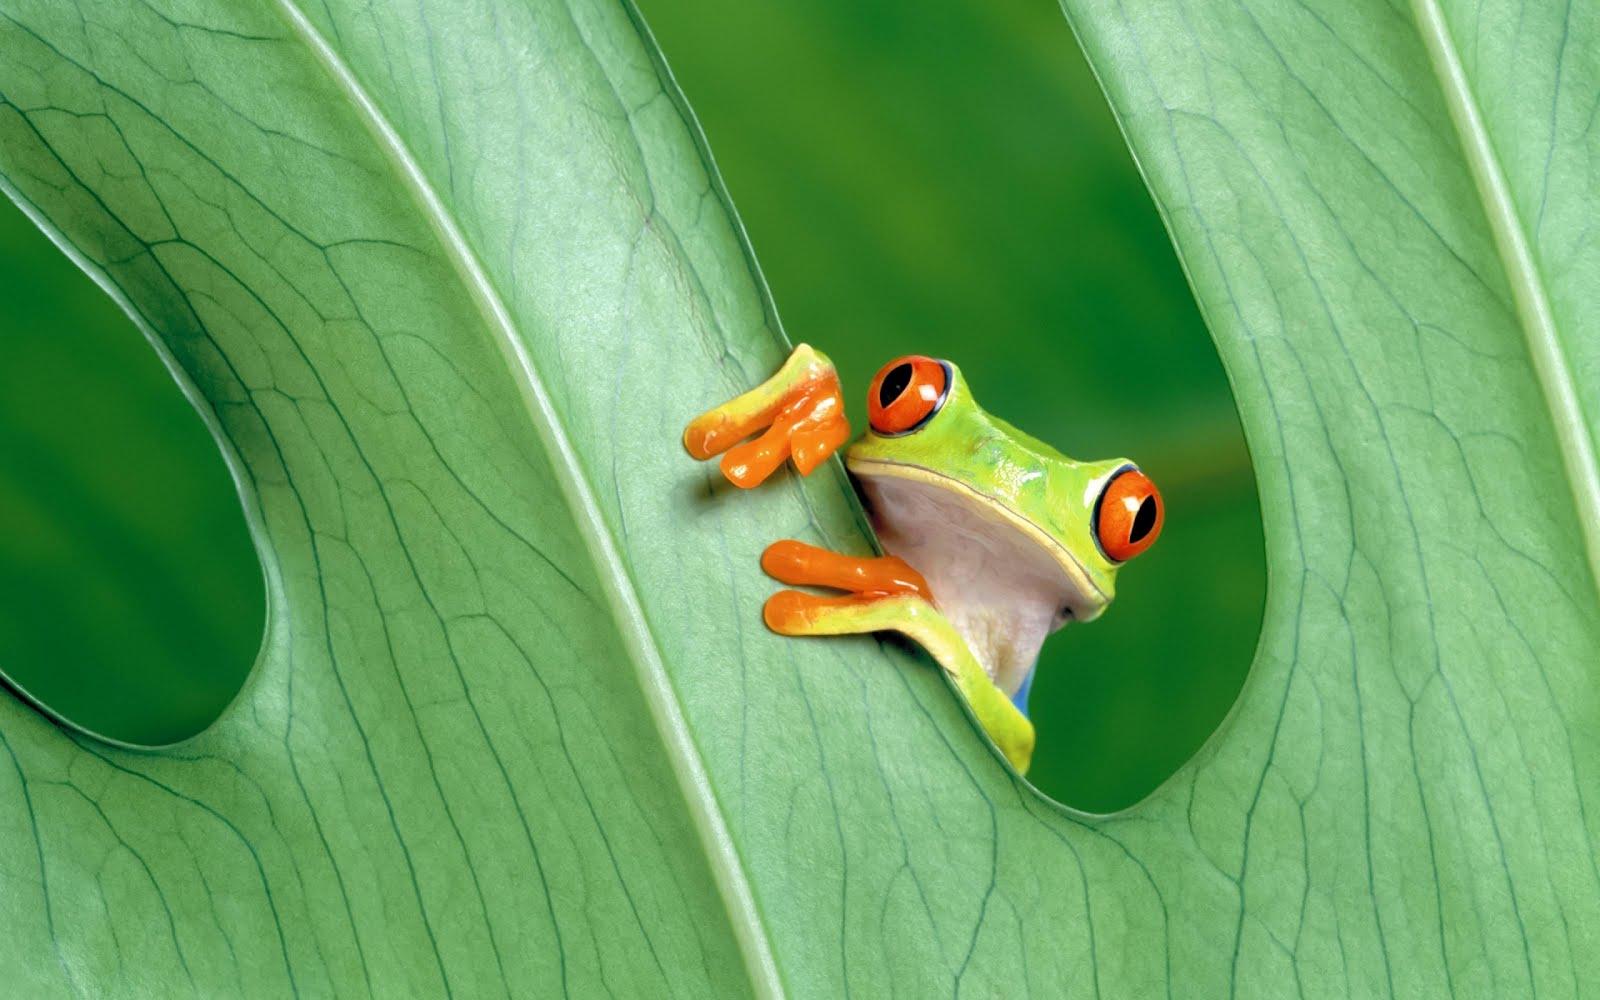 http://2.bp.blogspot.com/-zqzLa19GBUs/T-KBLaygH7I/AAAAAAAA80Q/0JpRuB1OgCc/s1600/cute-little-frog-1920x1200-wallpaper-una-peque%25C3%25B1a-rana-reptiles.jpg